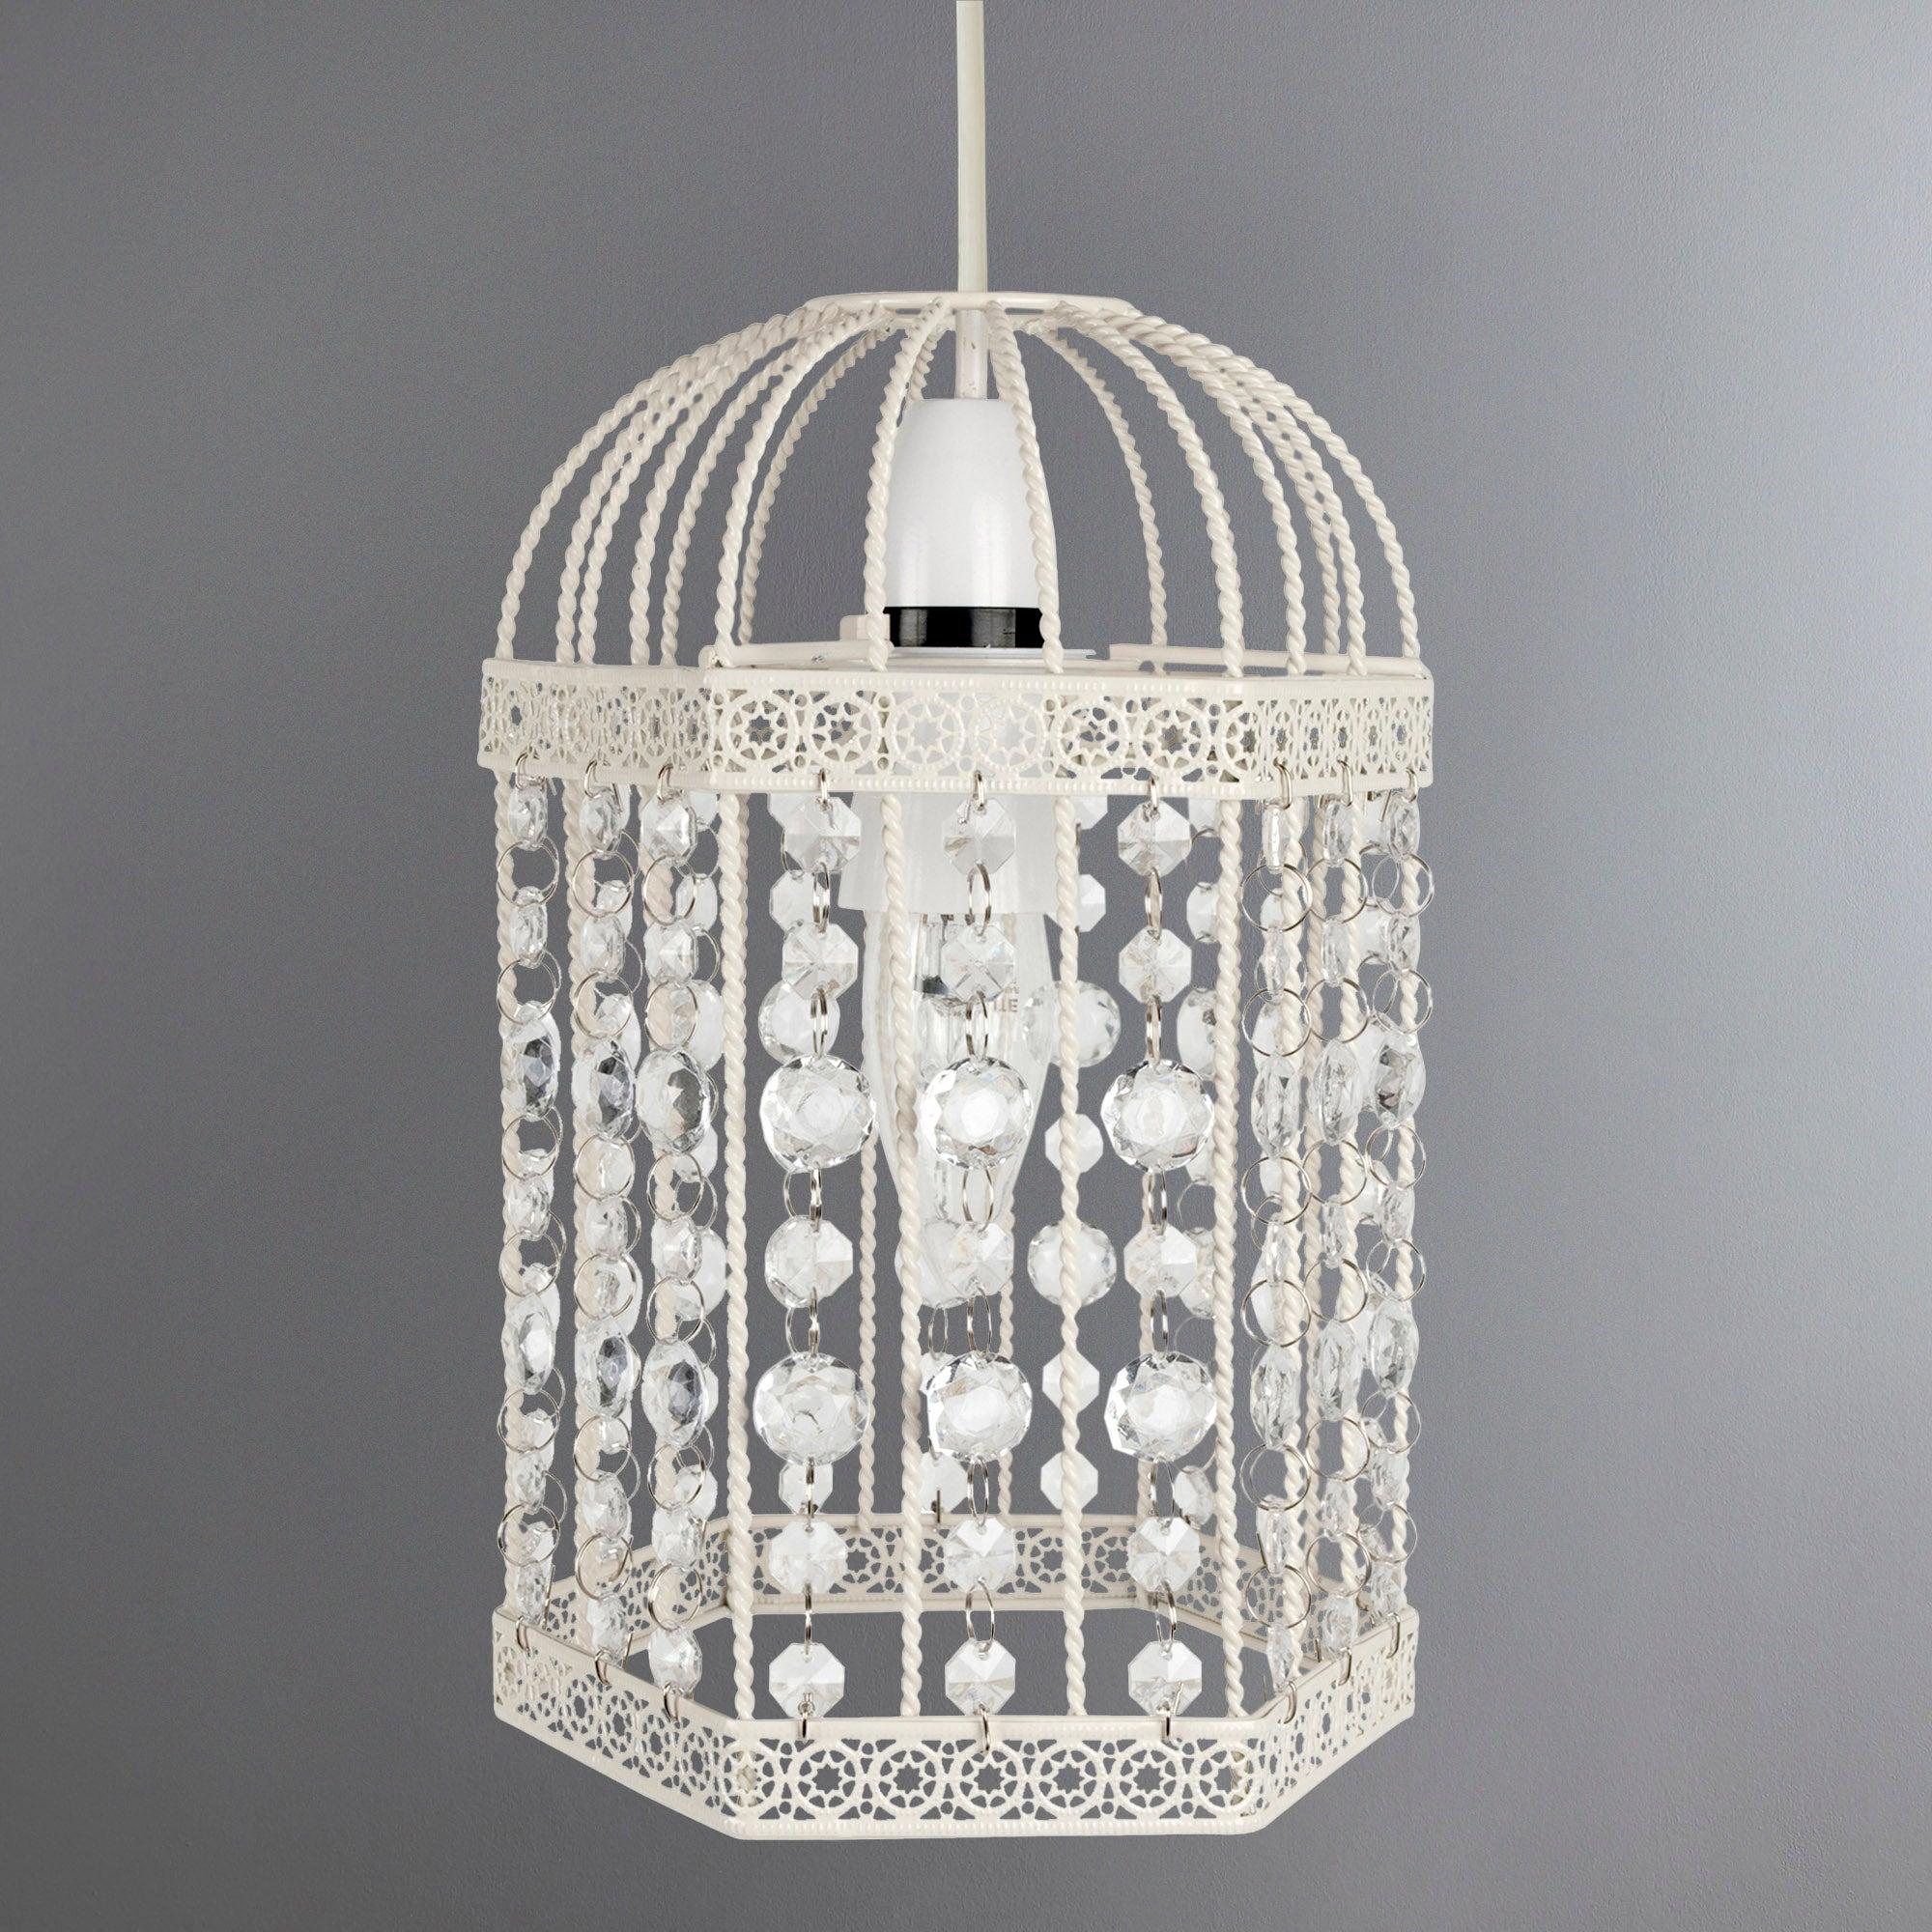 Birdcage Ceiling Pendant